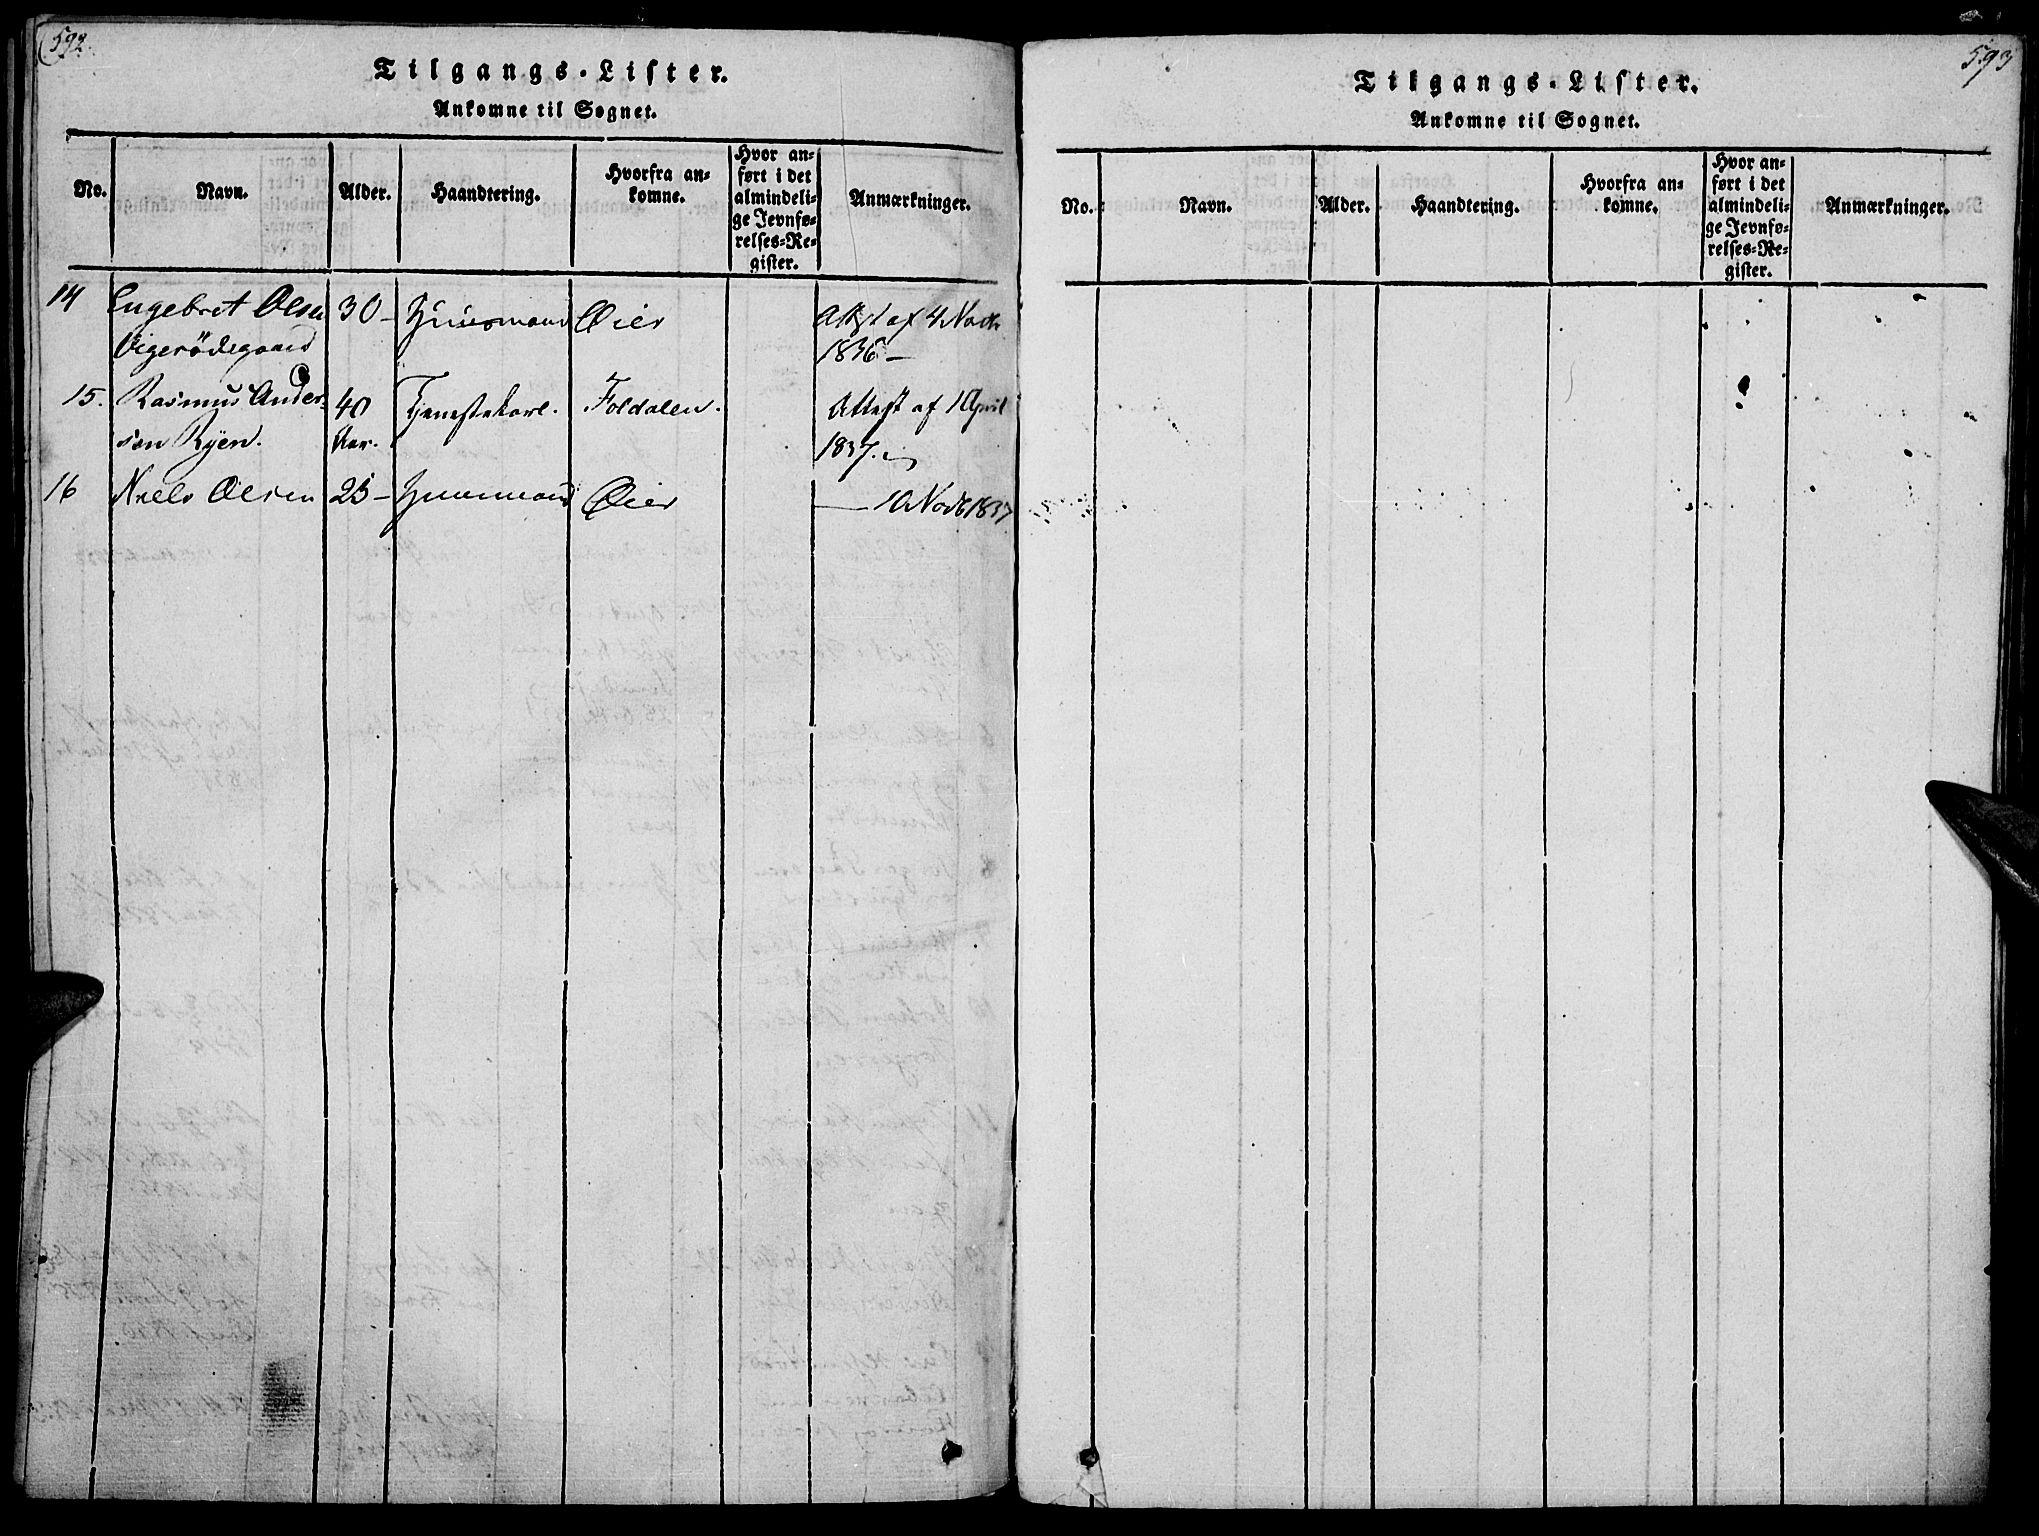 SAH, Ringebu prestekontor, Ministerialbok nr. 4, 1821-1839, s. 592-593